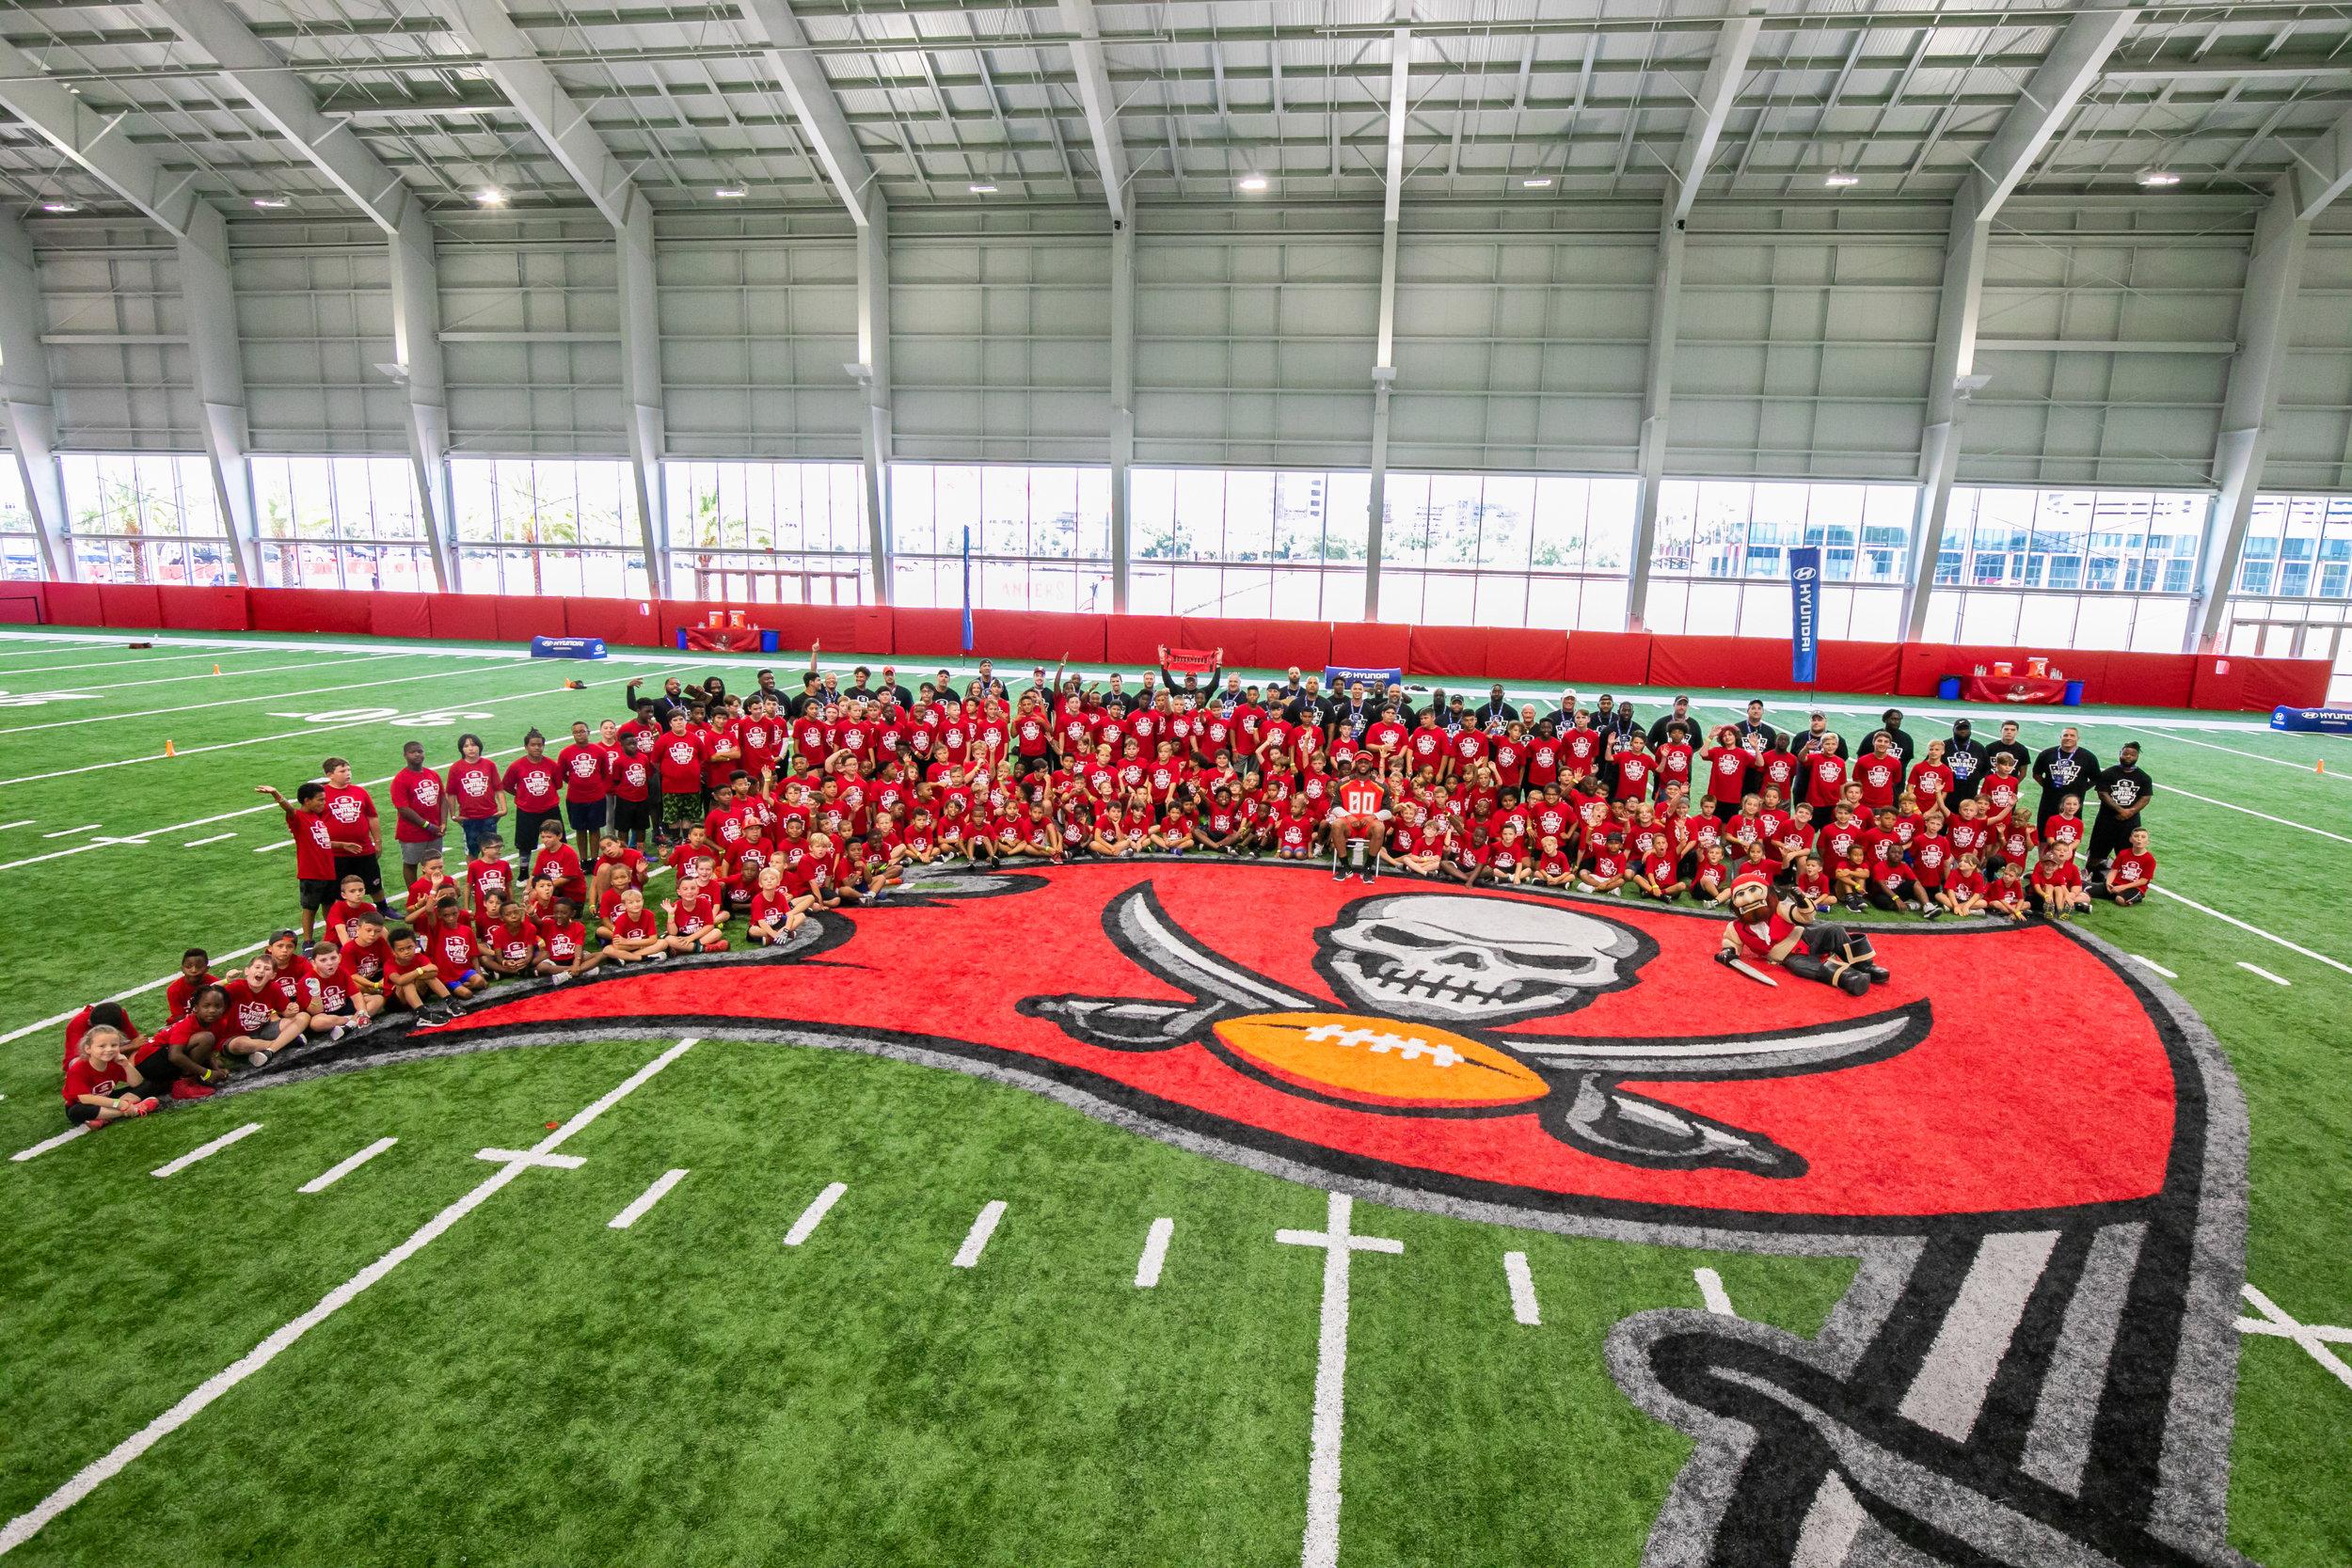 OHelloMedia-Hyundai-YouthFootballCamps-TampaBay-TopSelect--51.jpg